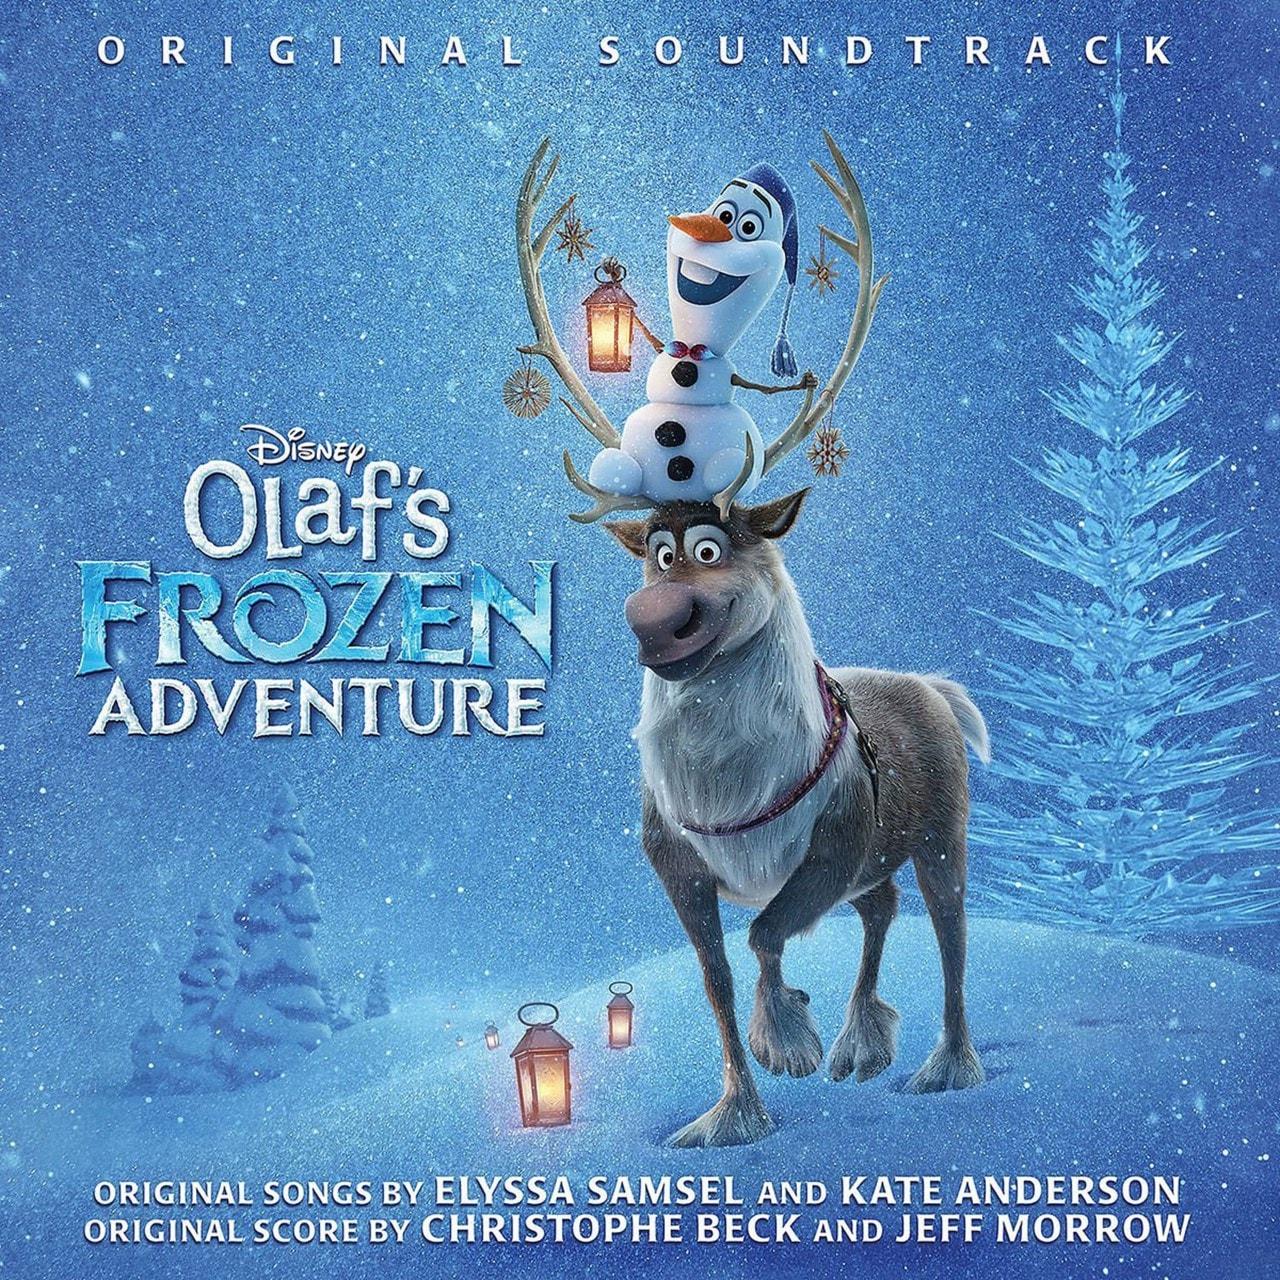 Olaf's Frozen Adventure - 1